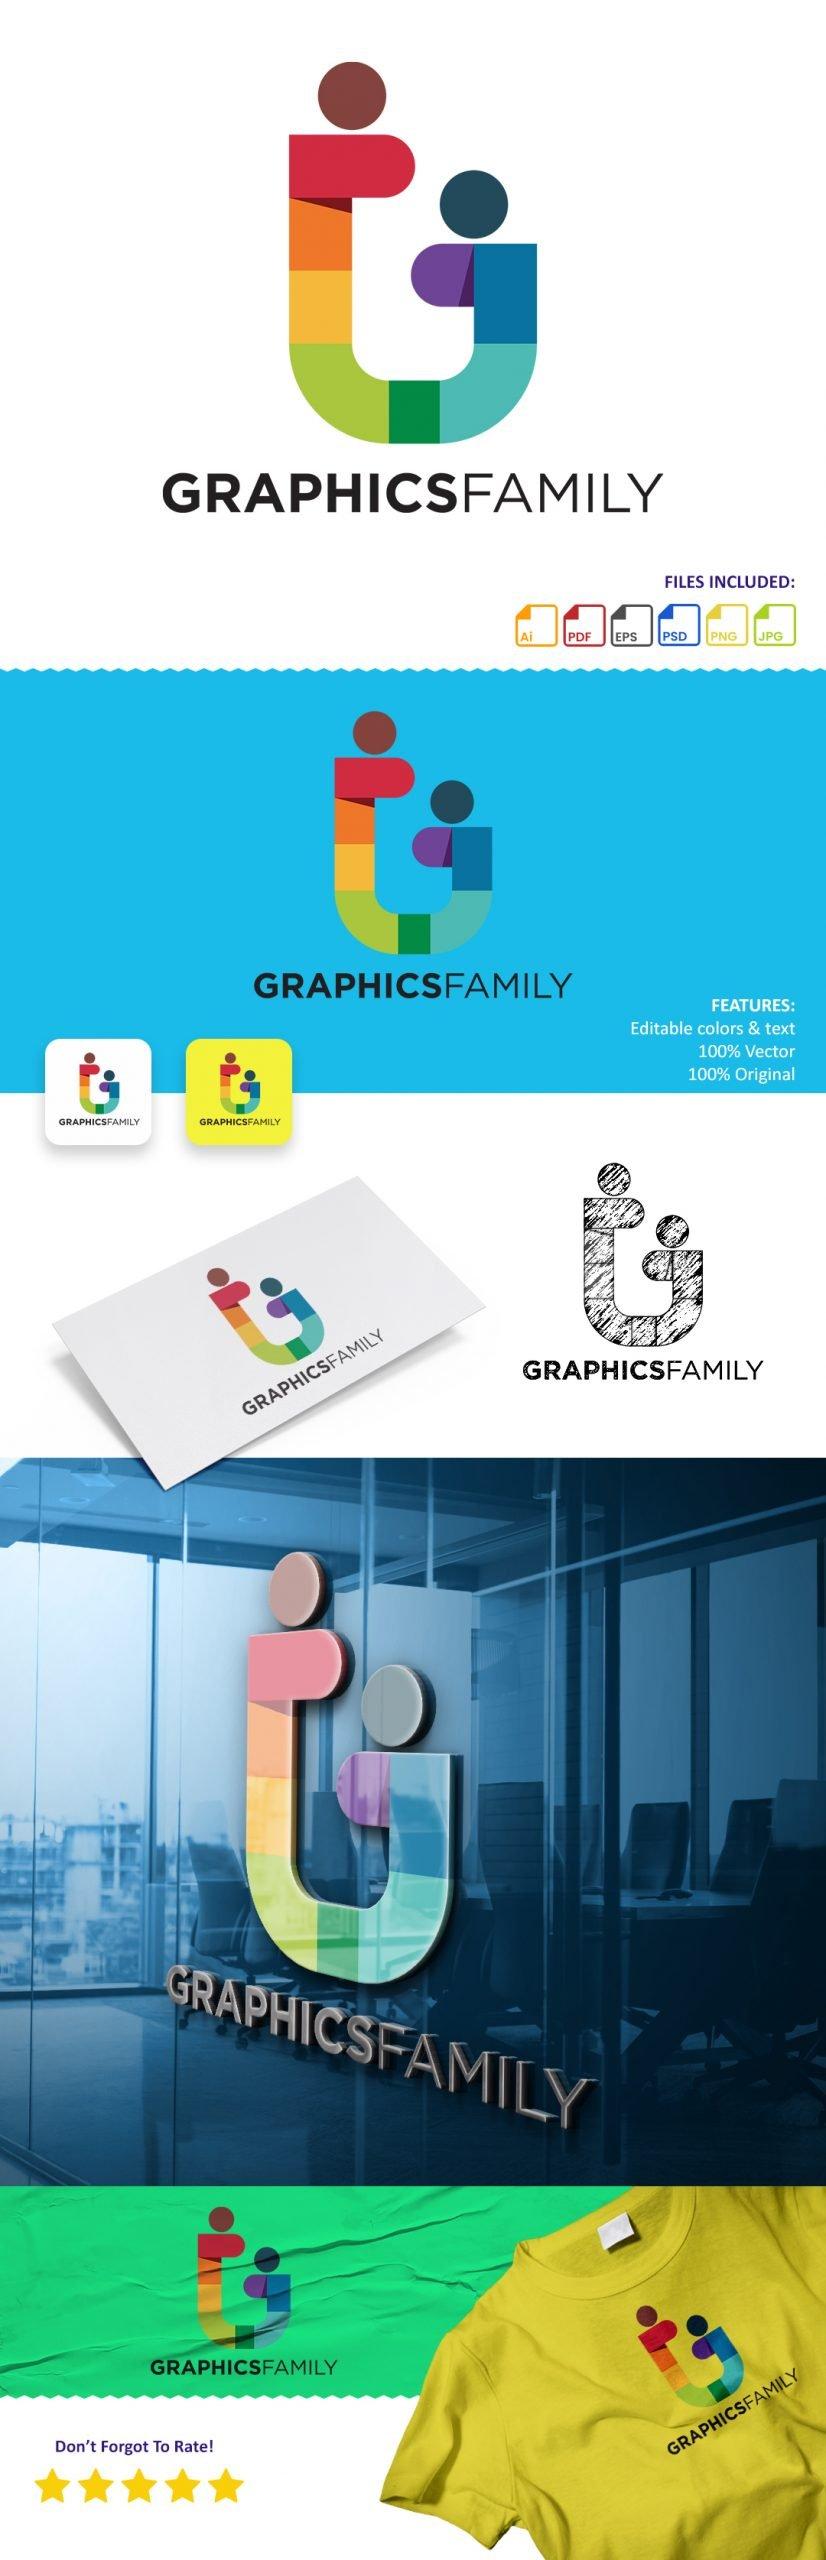 Best Logo Preview Image Generator